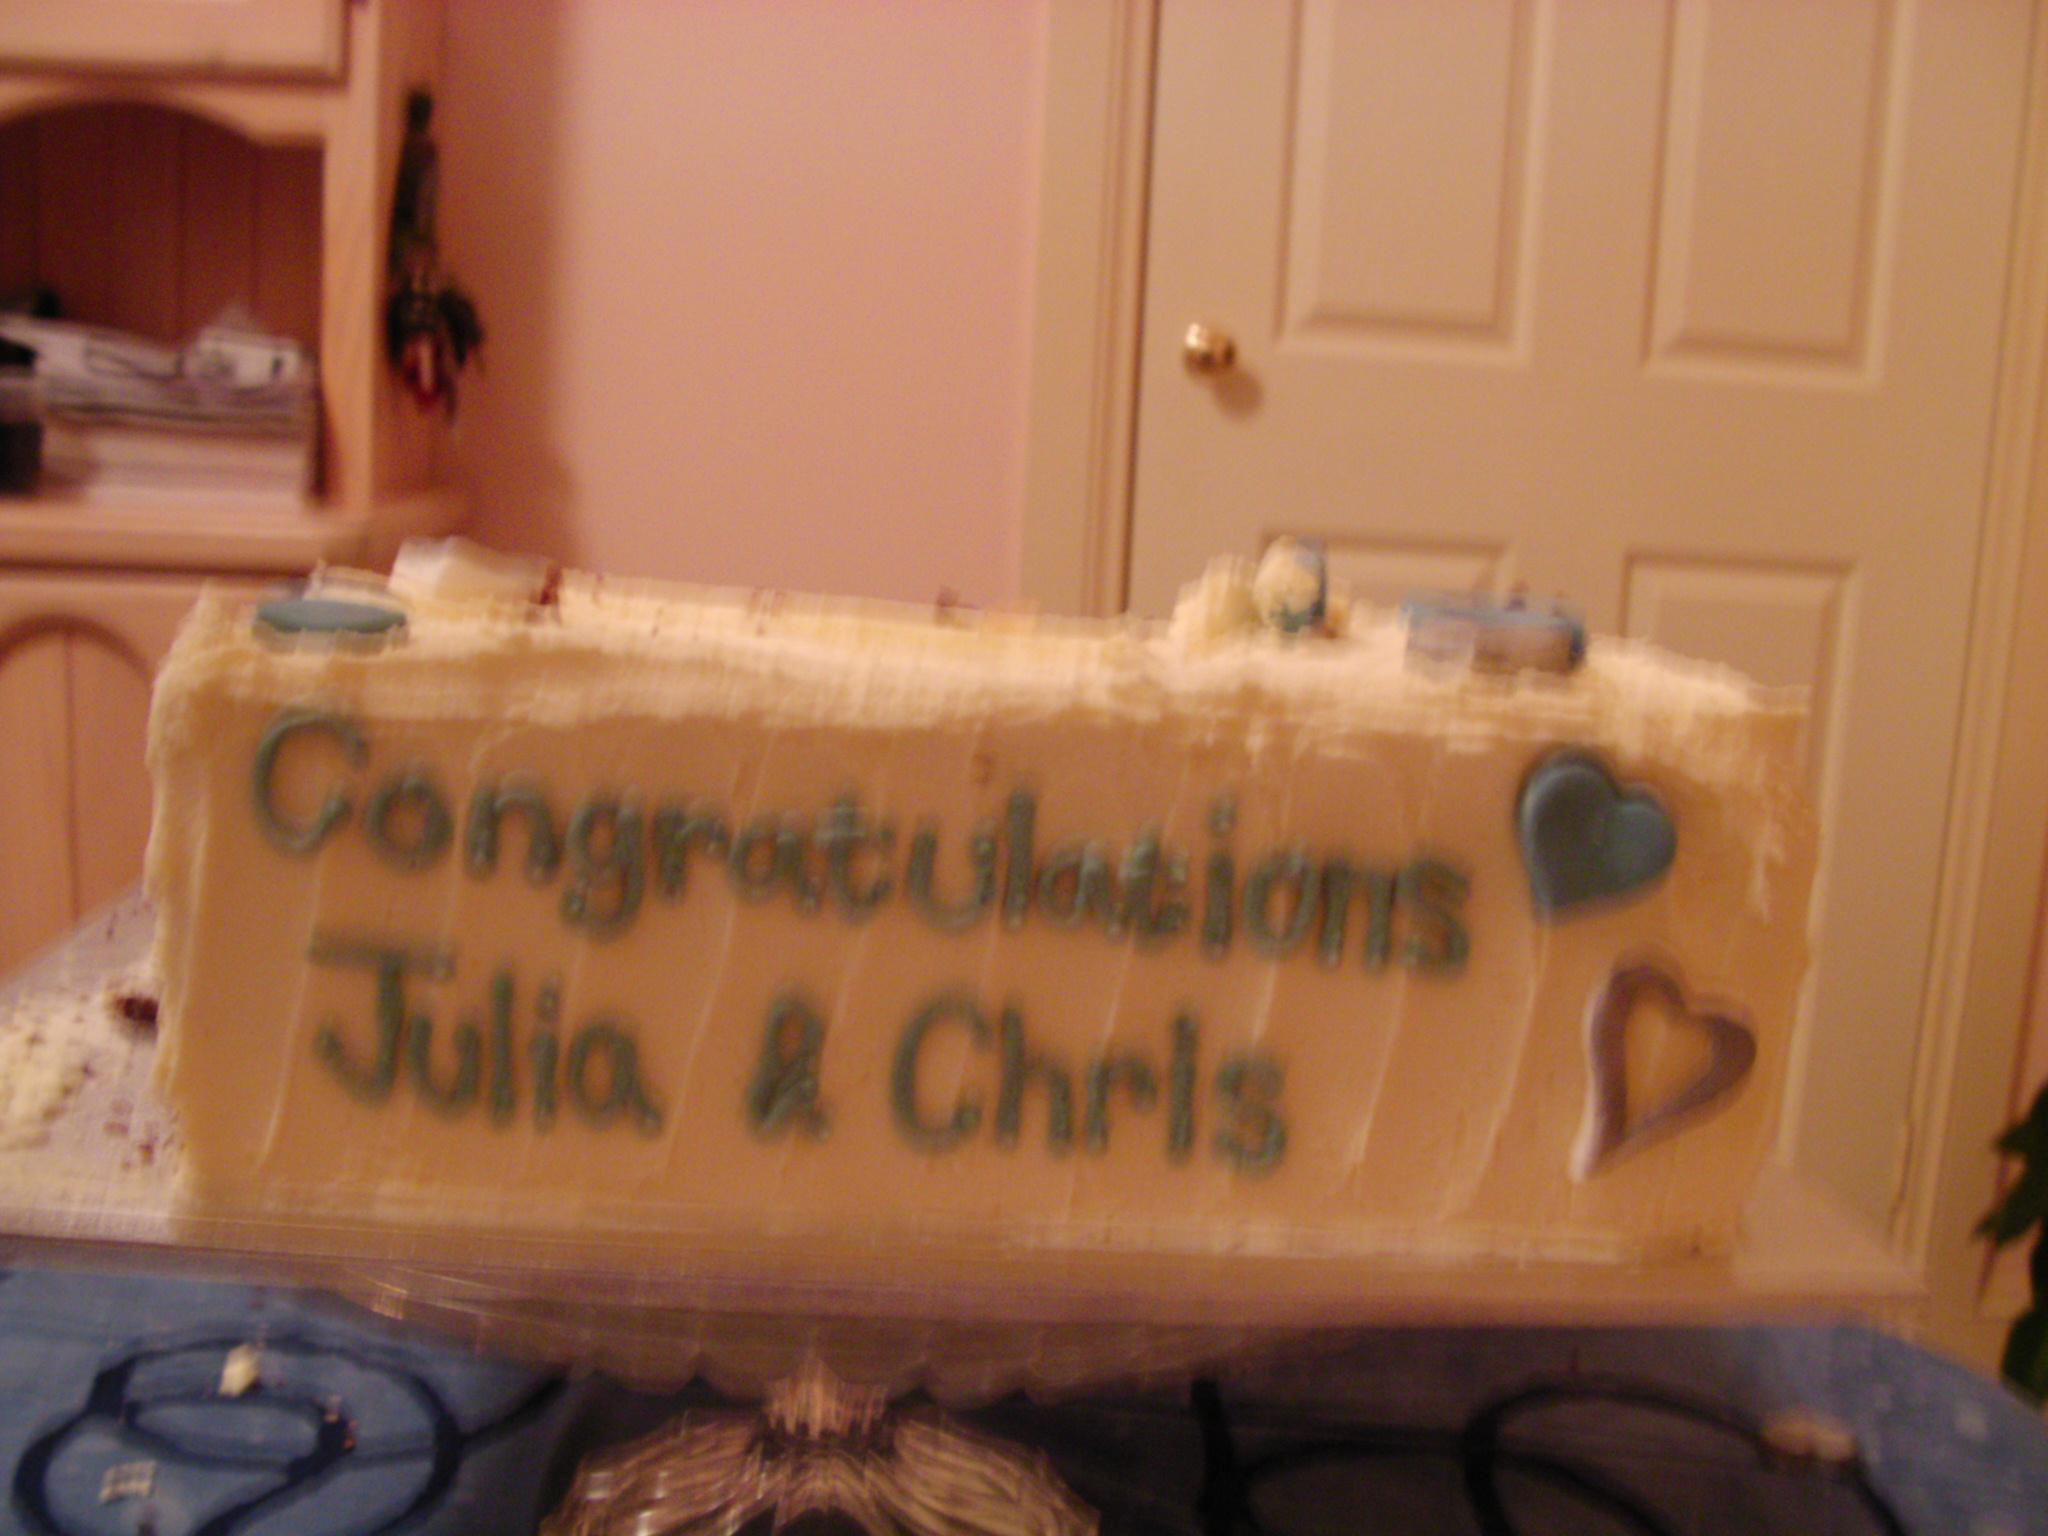 Congratulations Julie and Craig